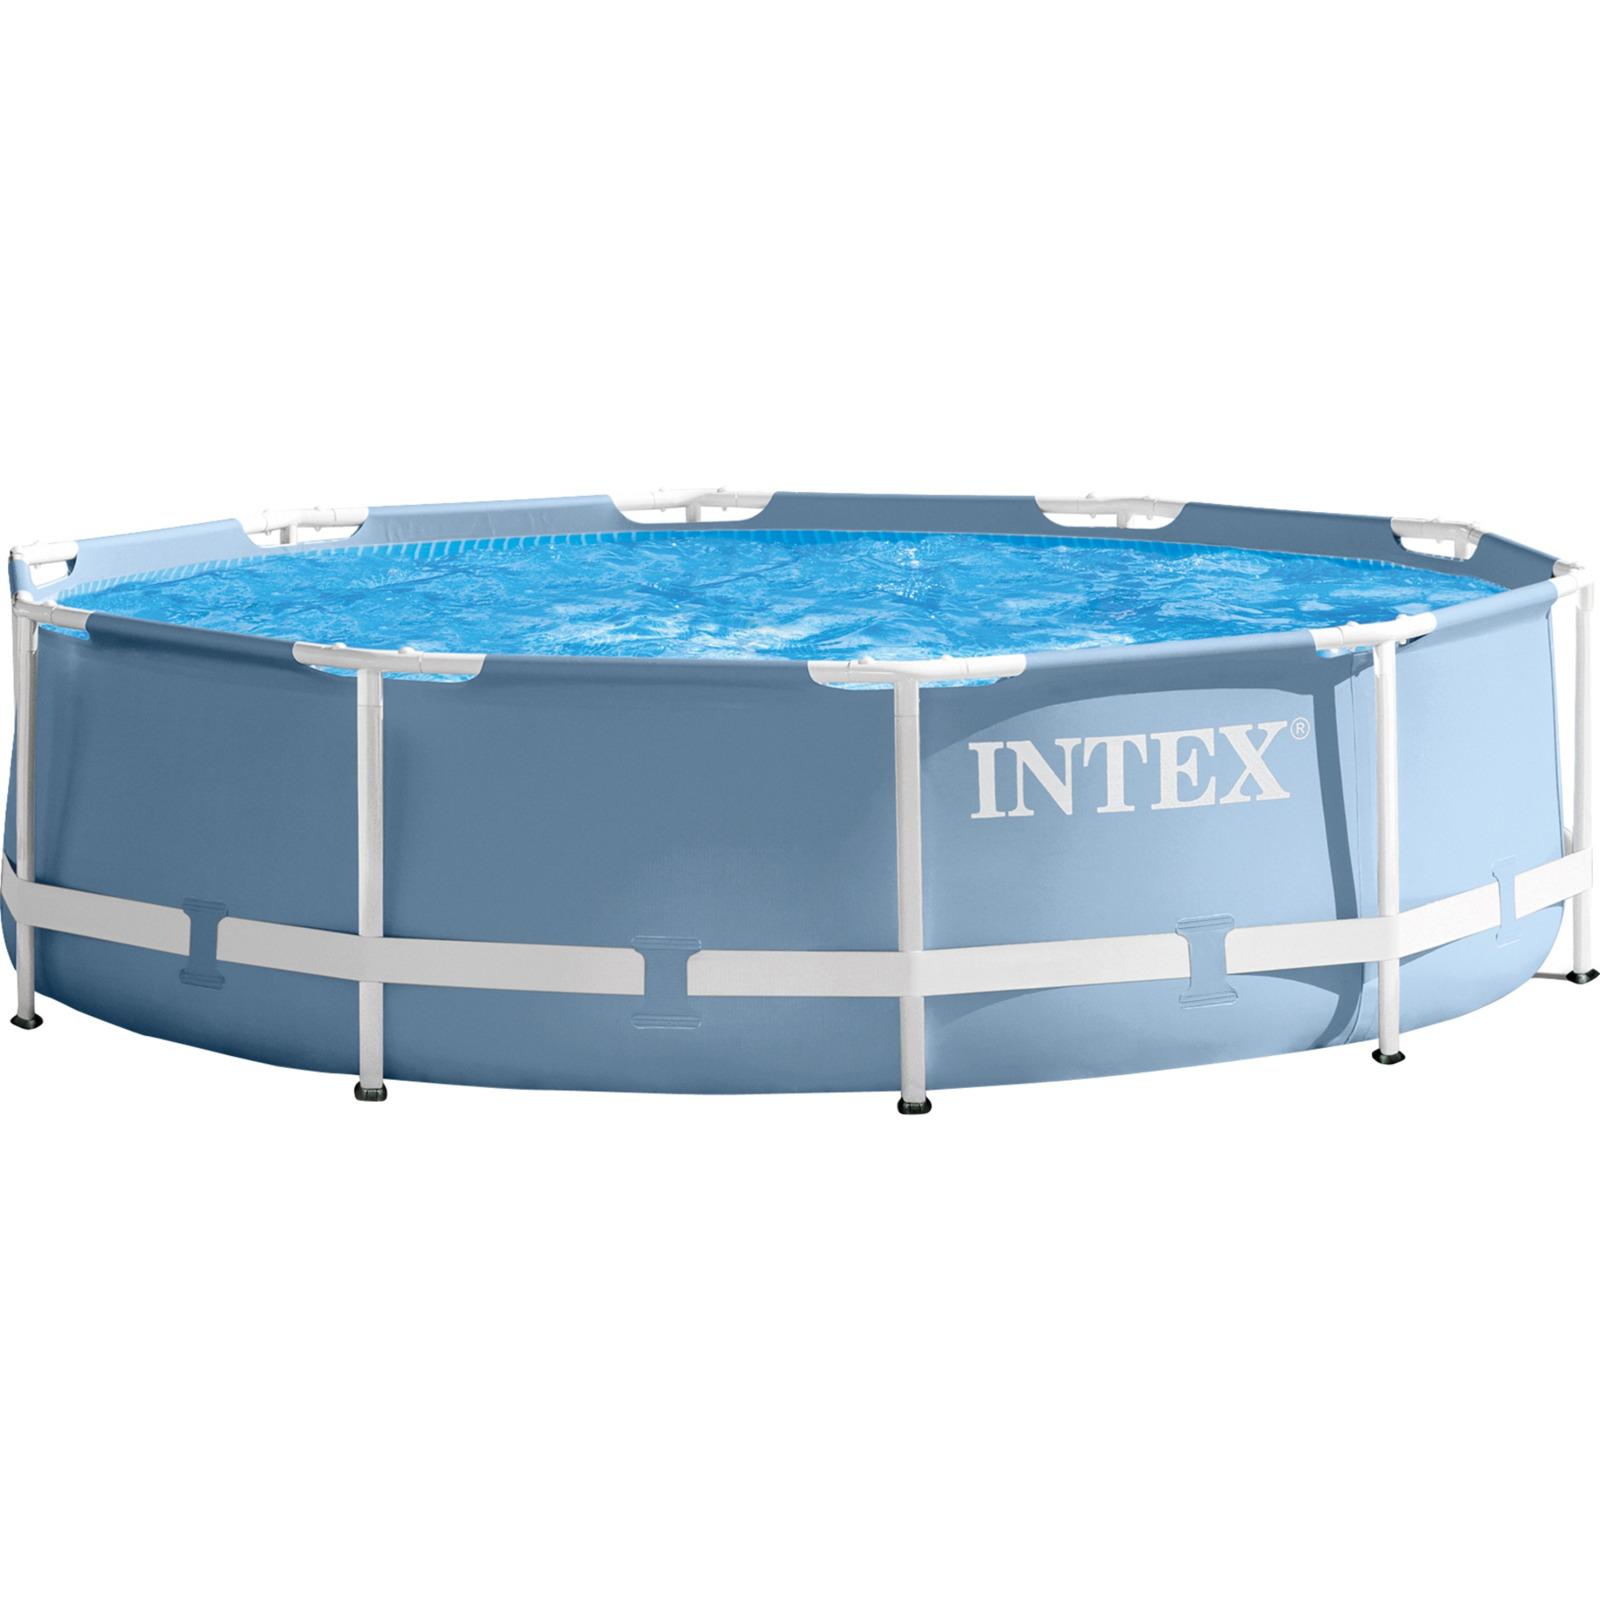 Бассейн каркасный Intex Prism Frame, 26700NP, 4485 л, 305 х 76 см бассейн каркасный intex 28310 ultra frame 427х107см